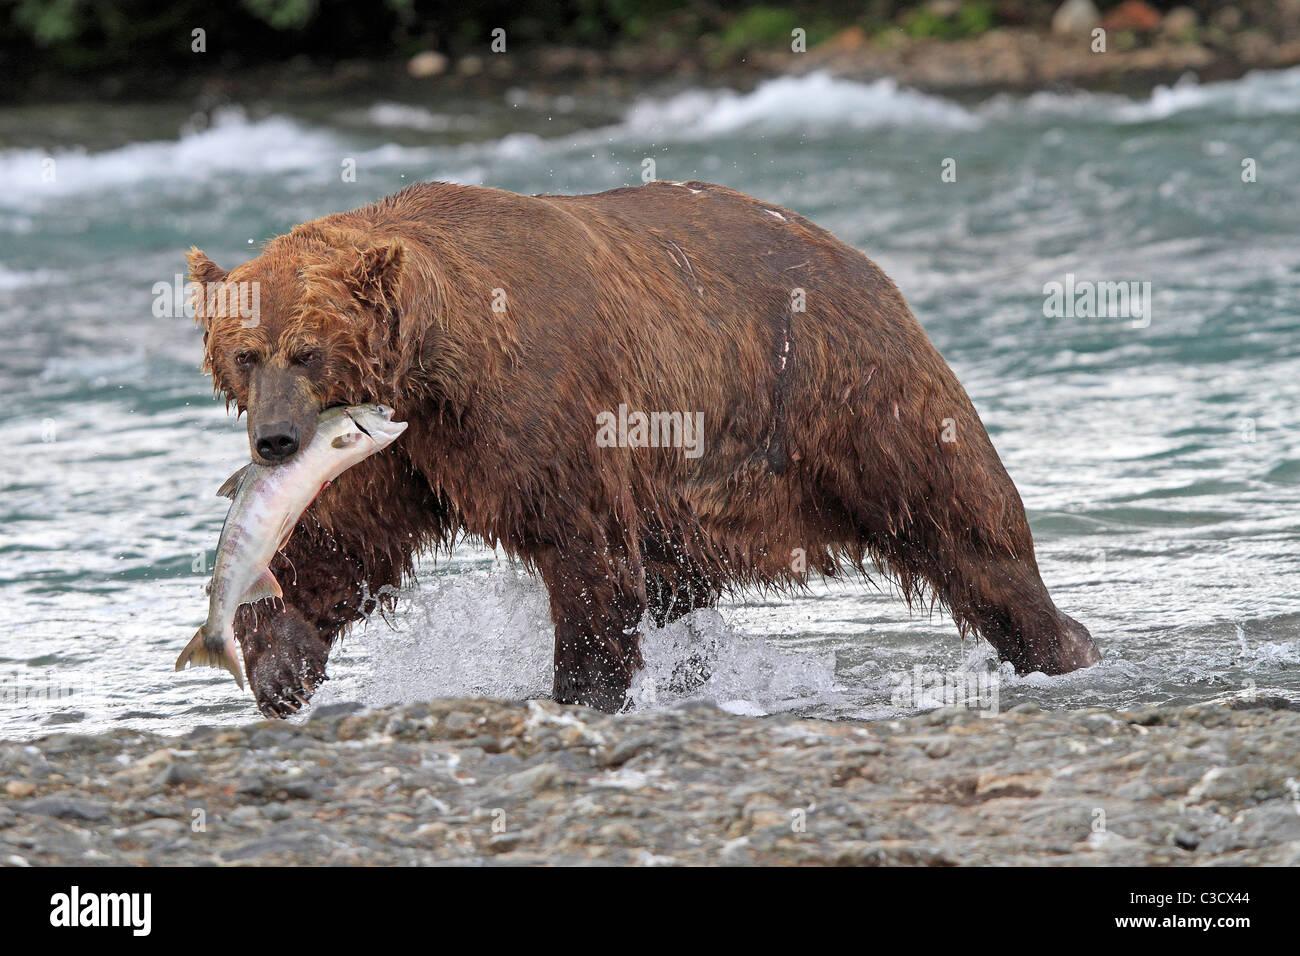 Alaskan Brown Bear (Ursus arctos middendorffi, Ursus middendorffi) with caught Chum Salmon in Mc Neil River. - Stock Image